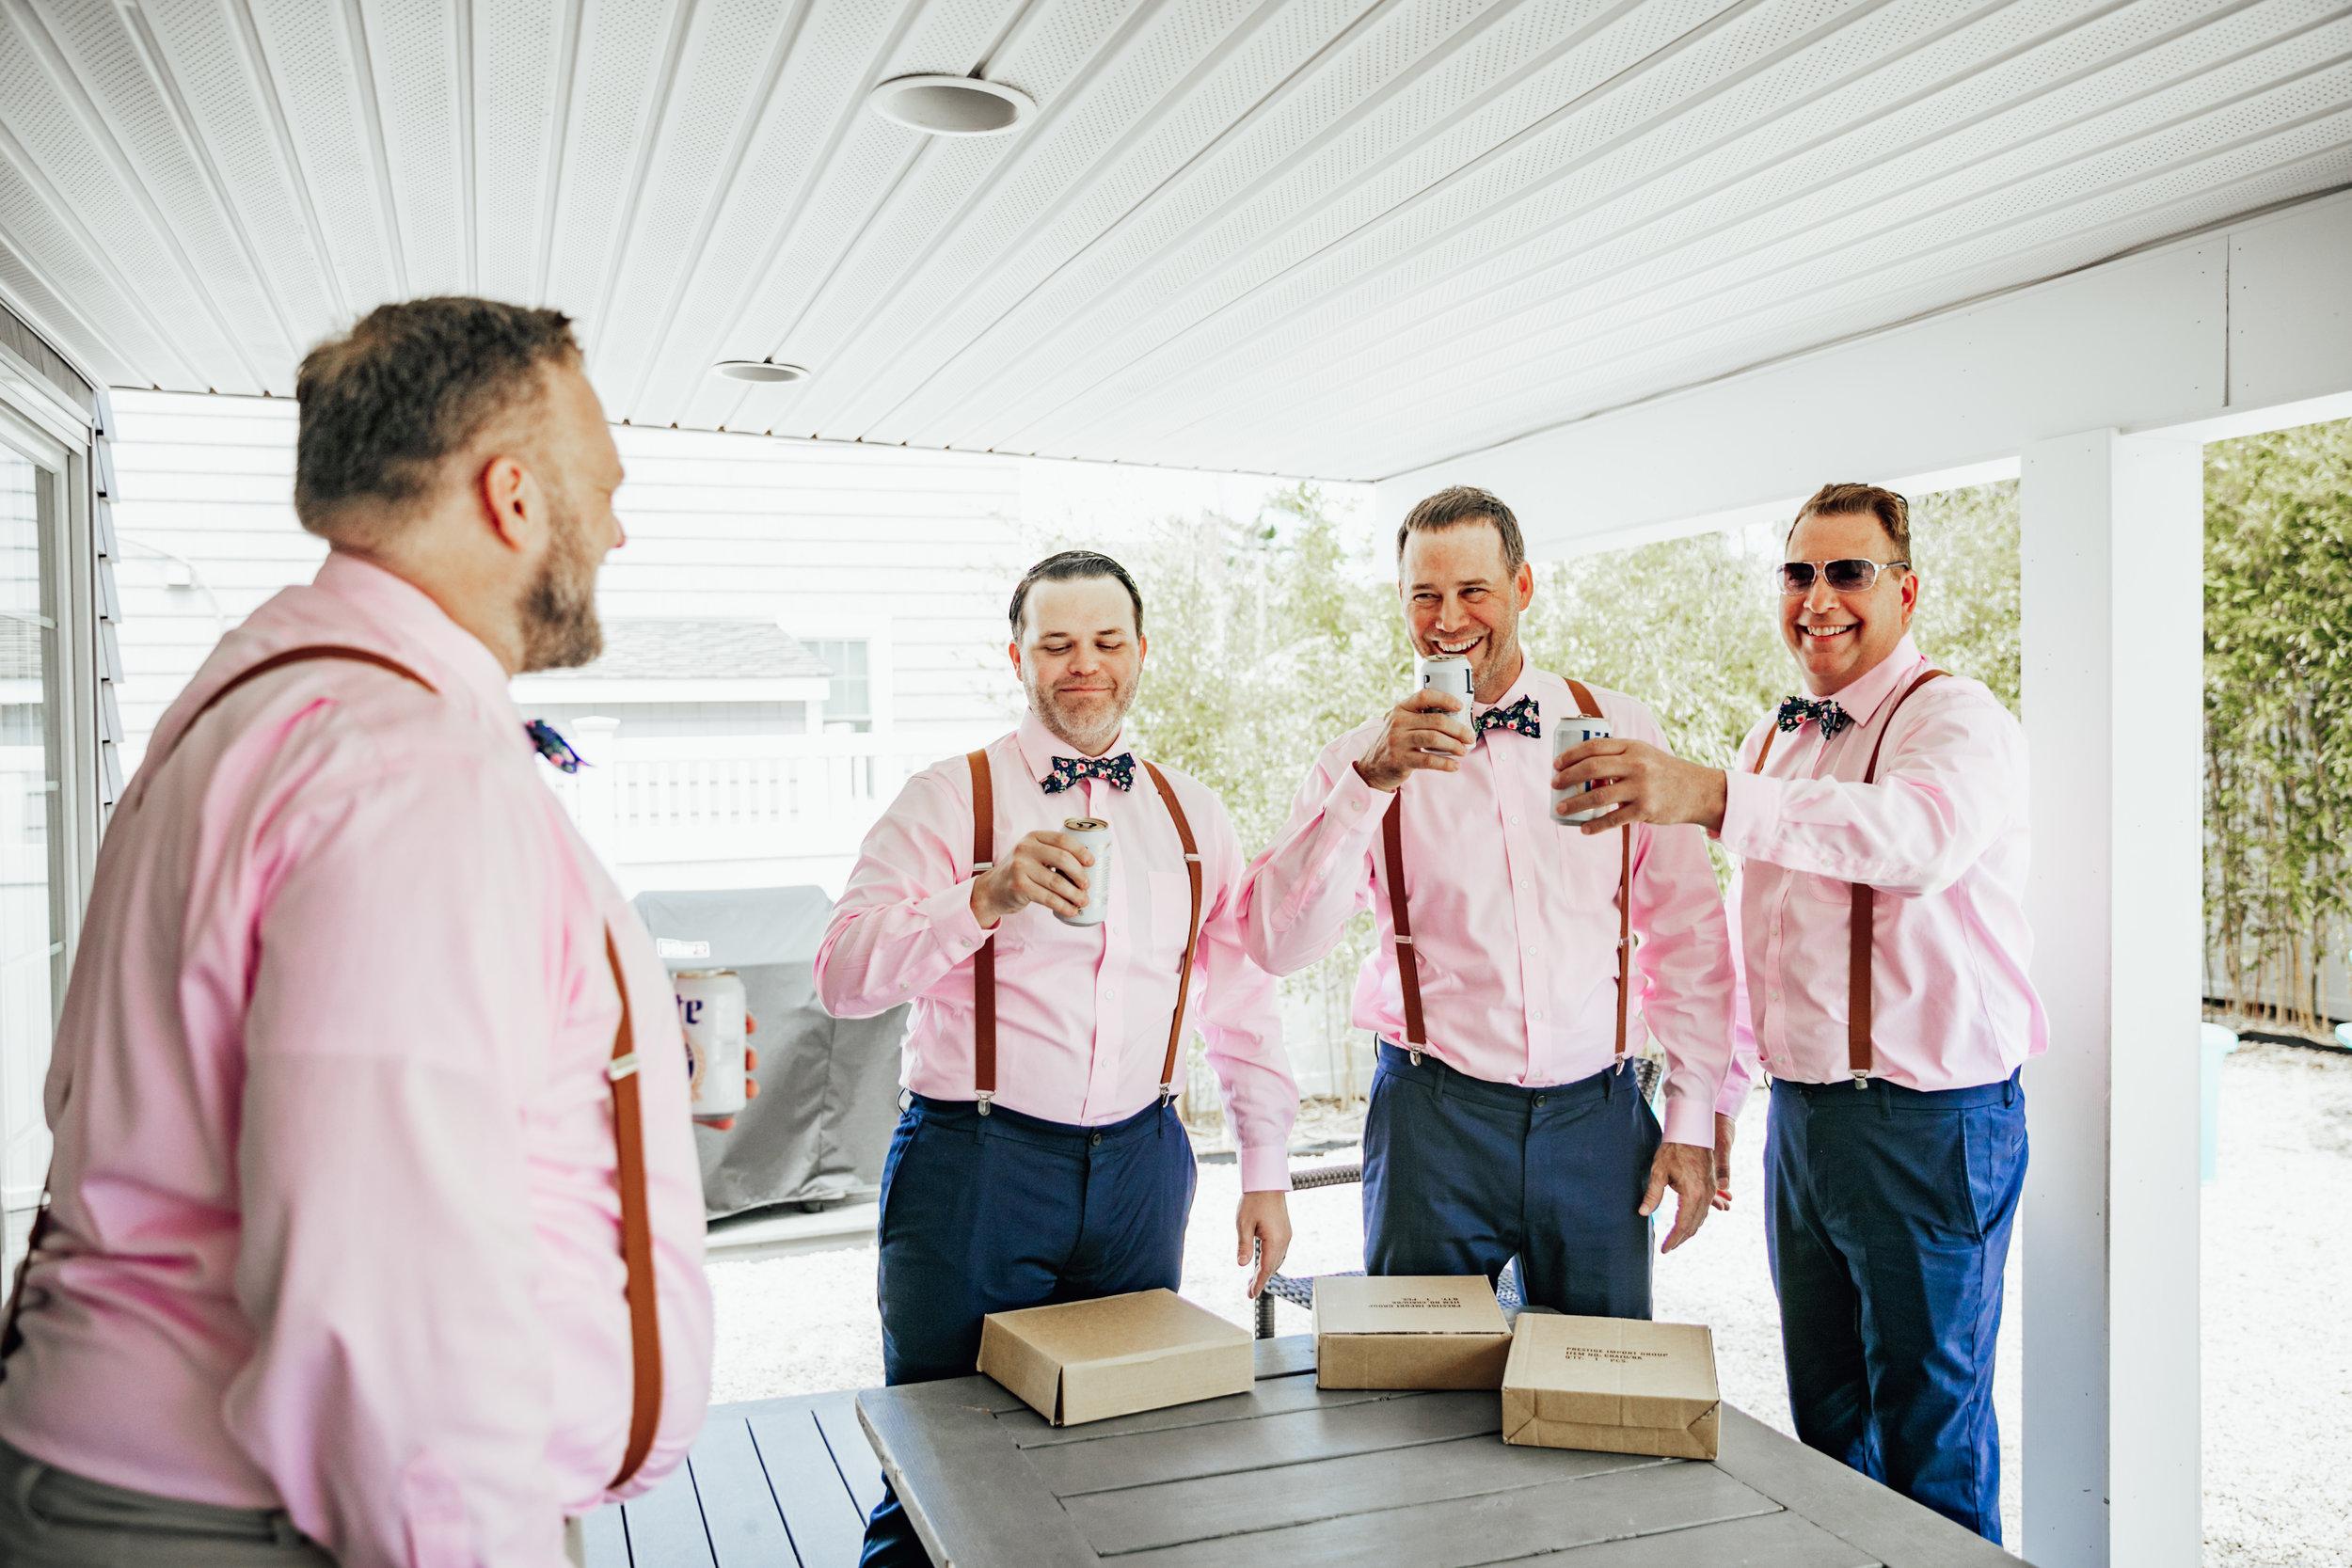 New Jersey Wedding Photographer, Felsberg Photography LBI wedding photography 47.jpg